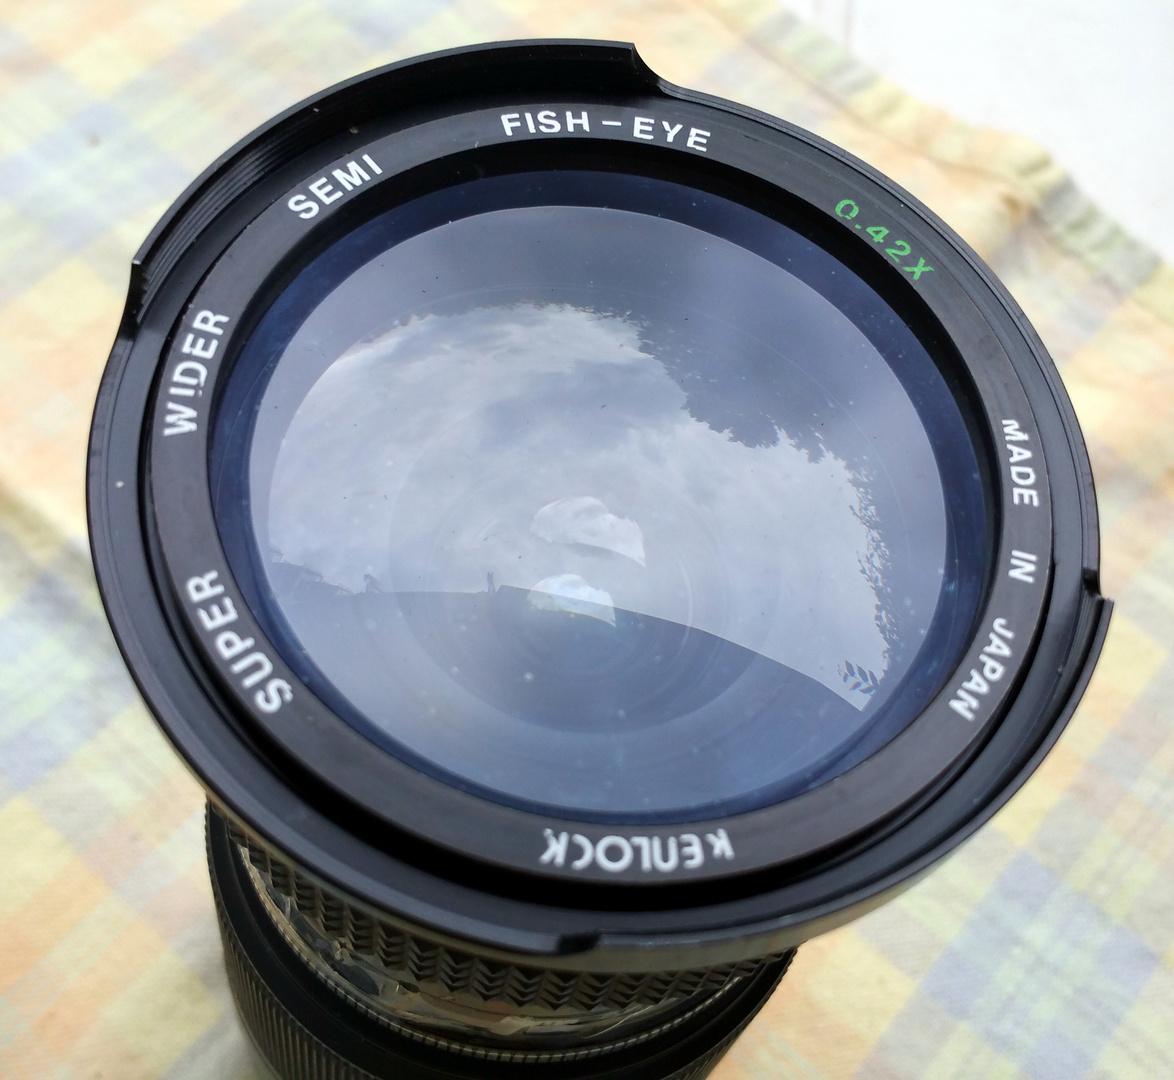 Kenlock Super Wider Semi Fish-eye 1991 + Sony DT 3.5-5.6/18–70 mm 2008